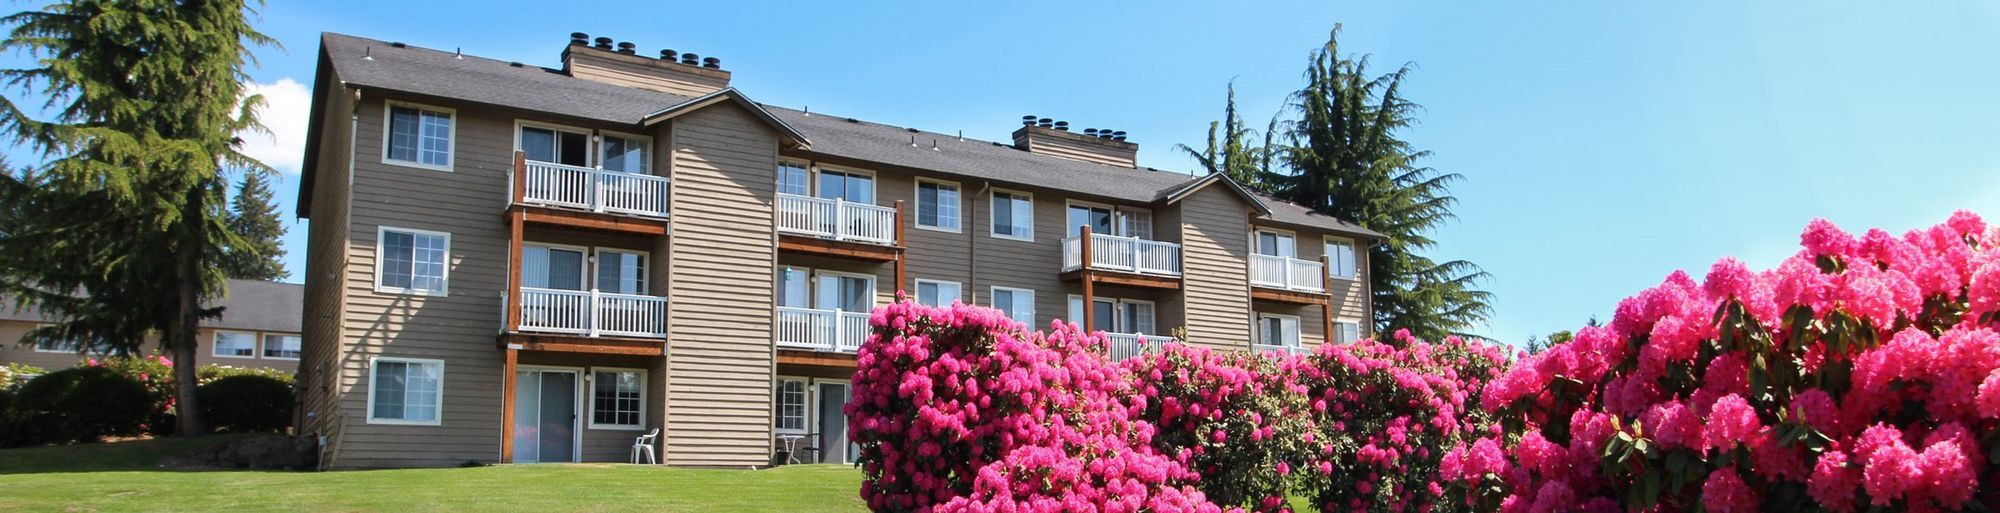 Black Lake Apartments rental